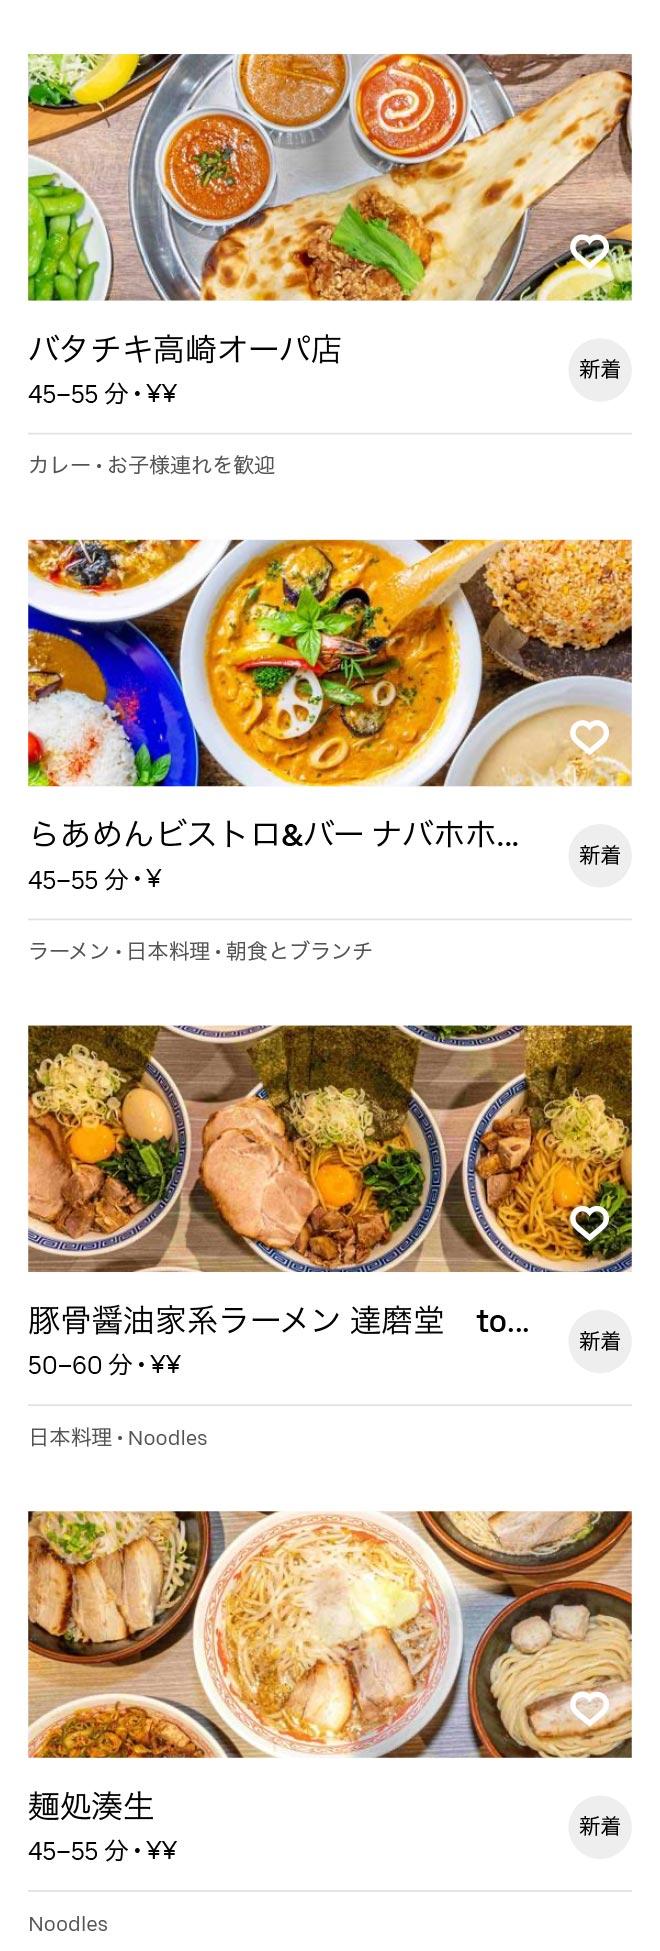 Tonyamachi menu 2009 3